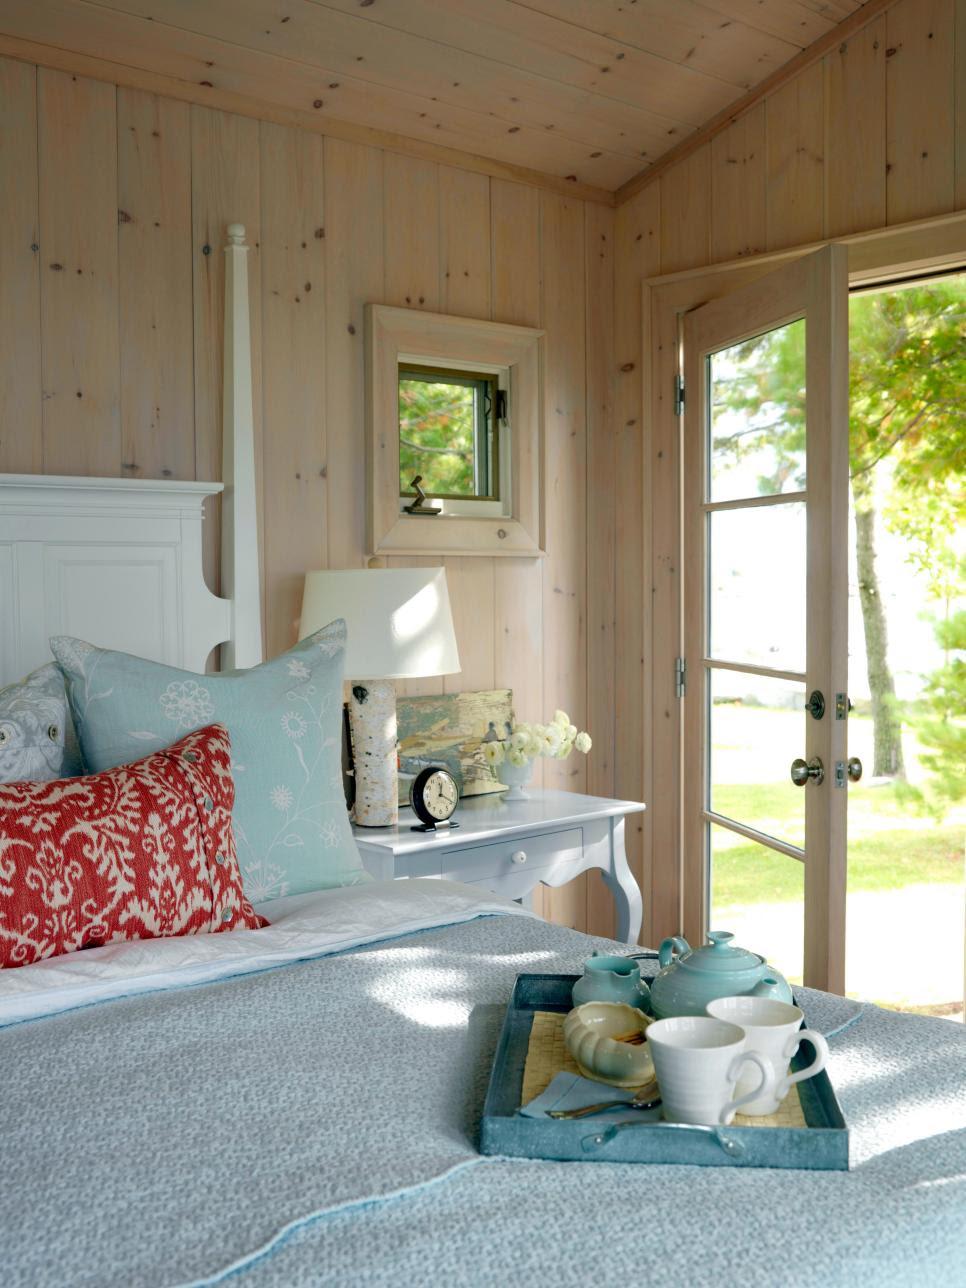 7 Guest Bedroom Design Ideas | HGTV